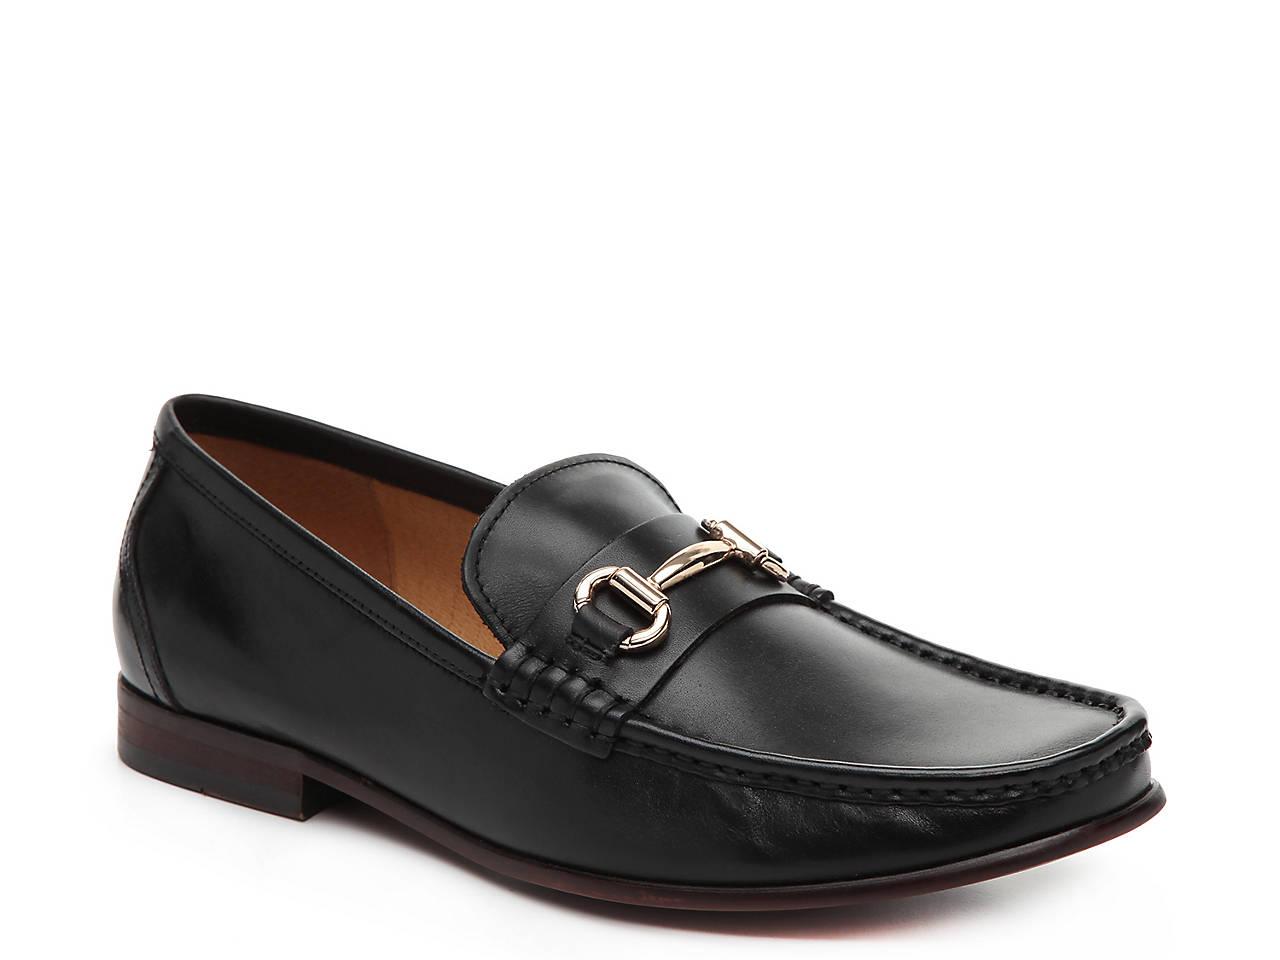 04b4cf56df2 Gere Loafer